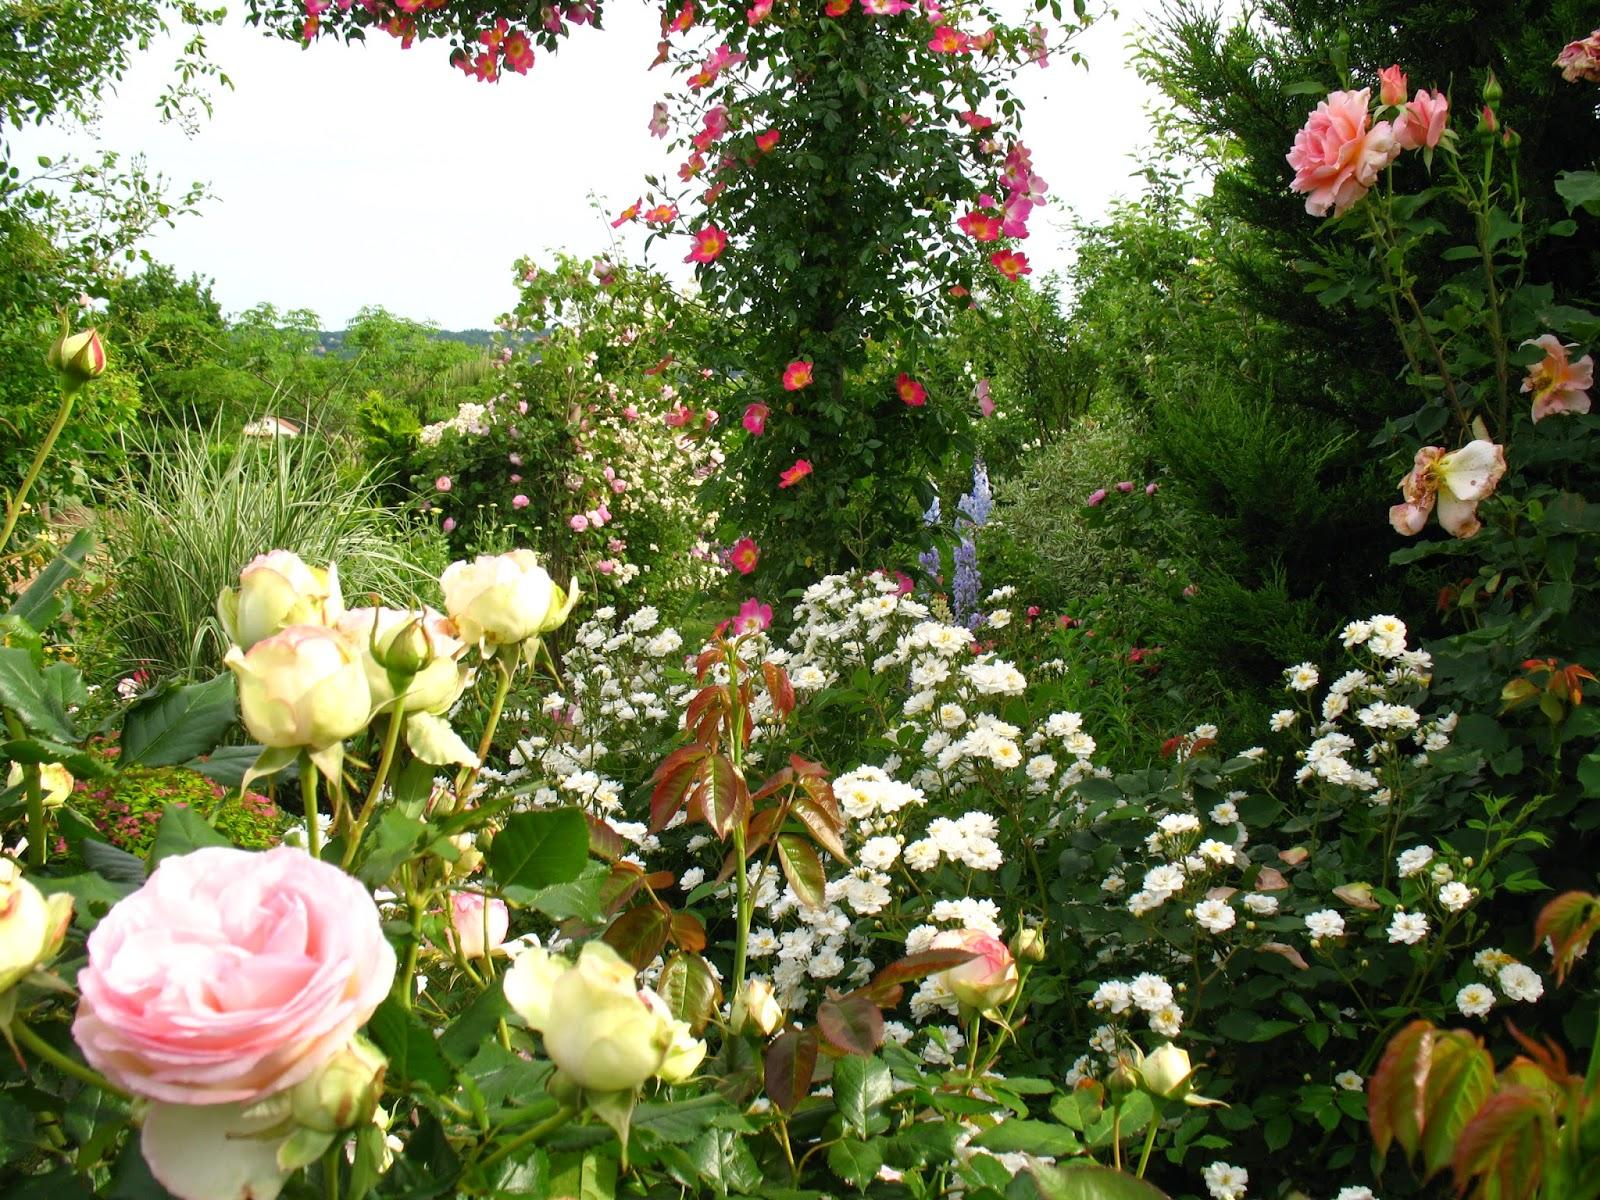 roses du jardin ch neland rosiers grimpants s duisants. Black Bedroom Furniture Sets. Home Design Ideas